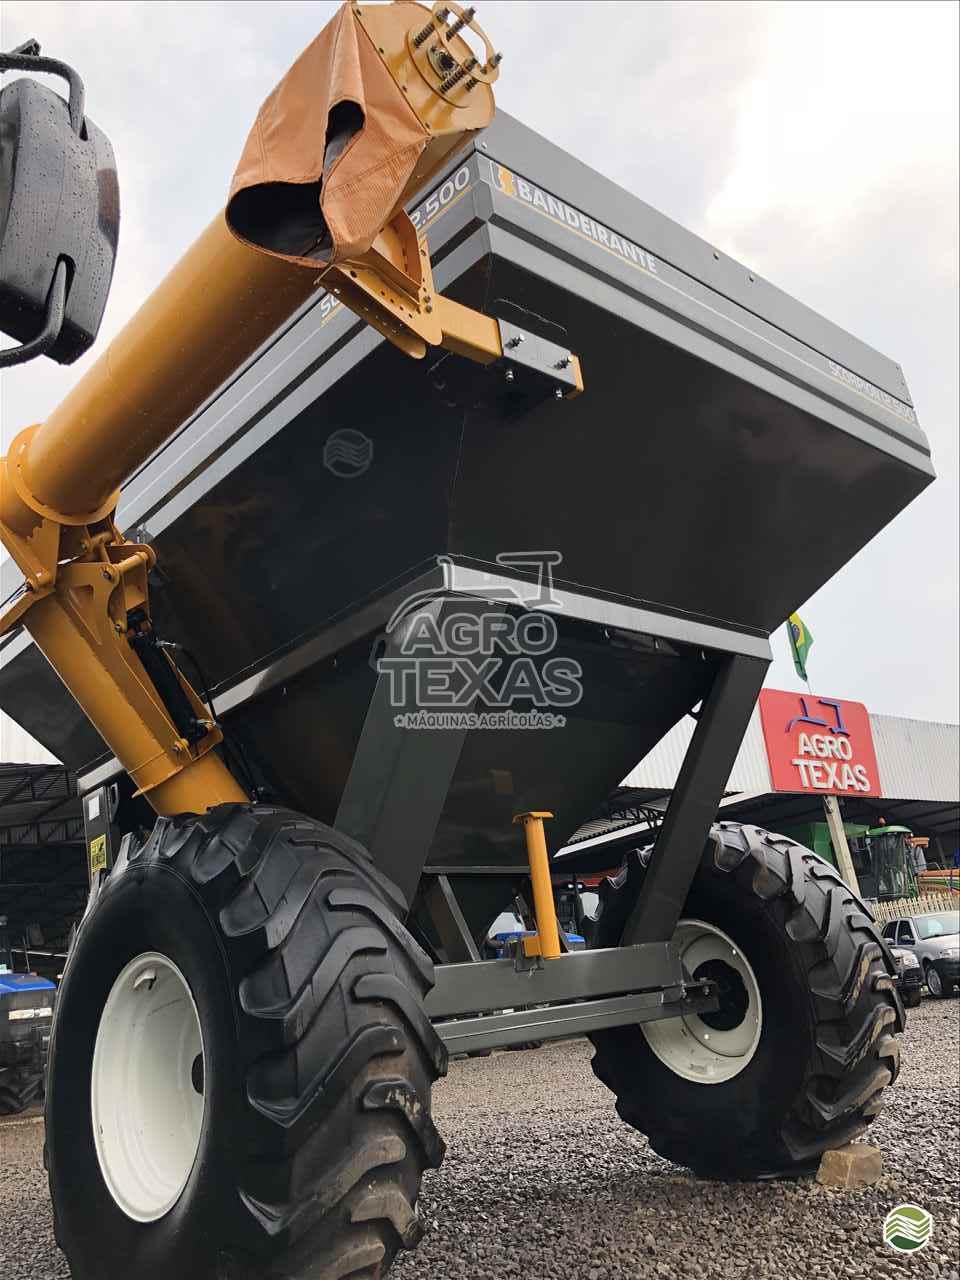 IMPLEMENTOS AGRICOLAS CARRETA BAZUKA GRANELEIRA 12500 Agro Texas Máquinas Agrícolas VITORINO PARANÁ PR